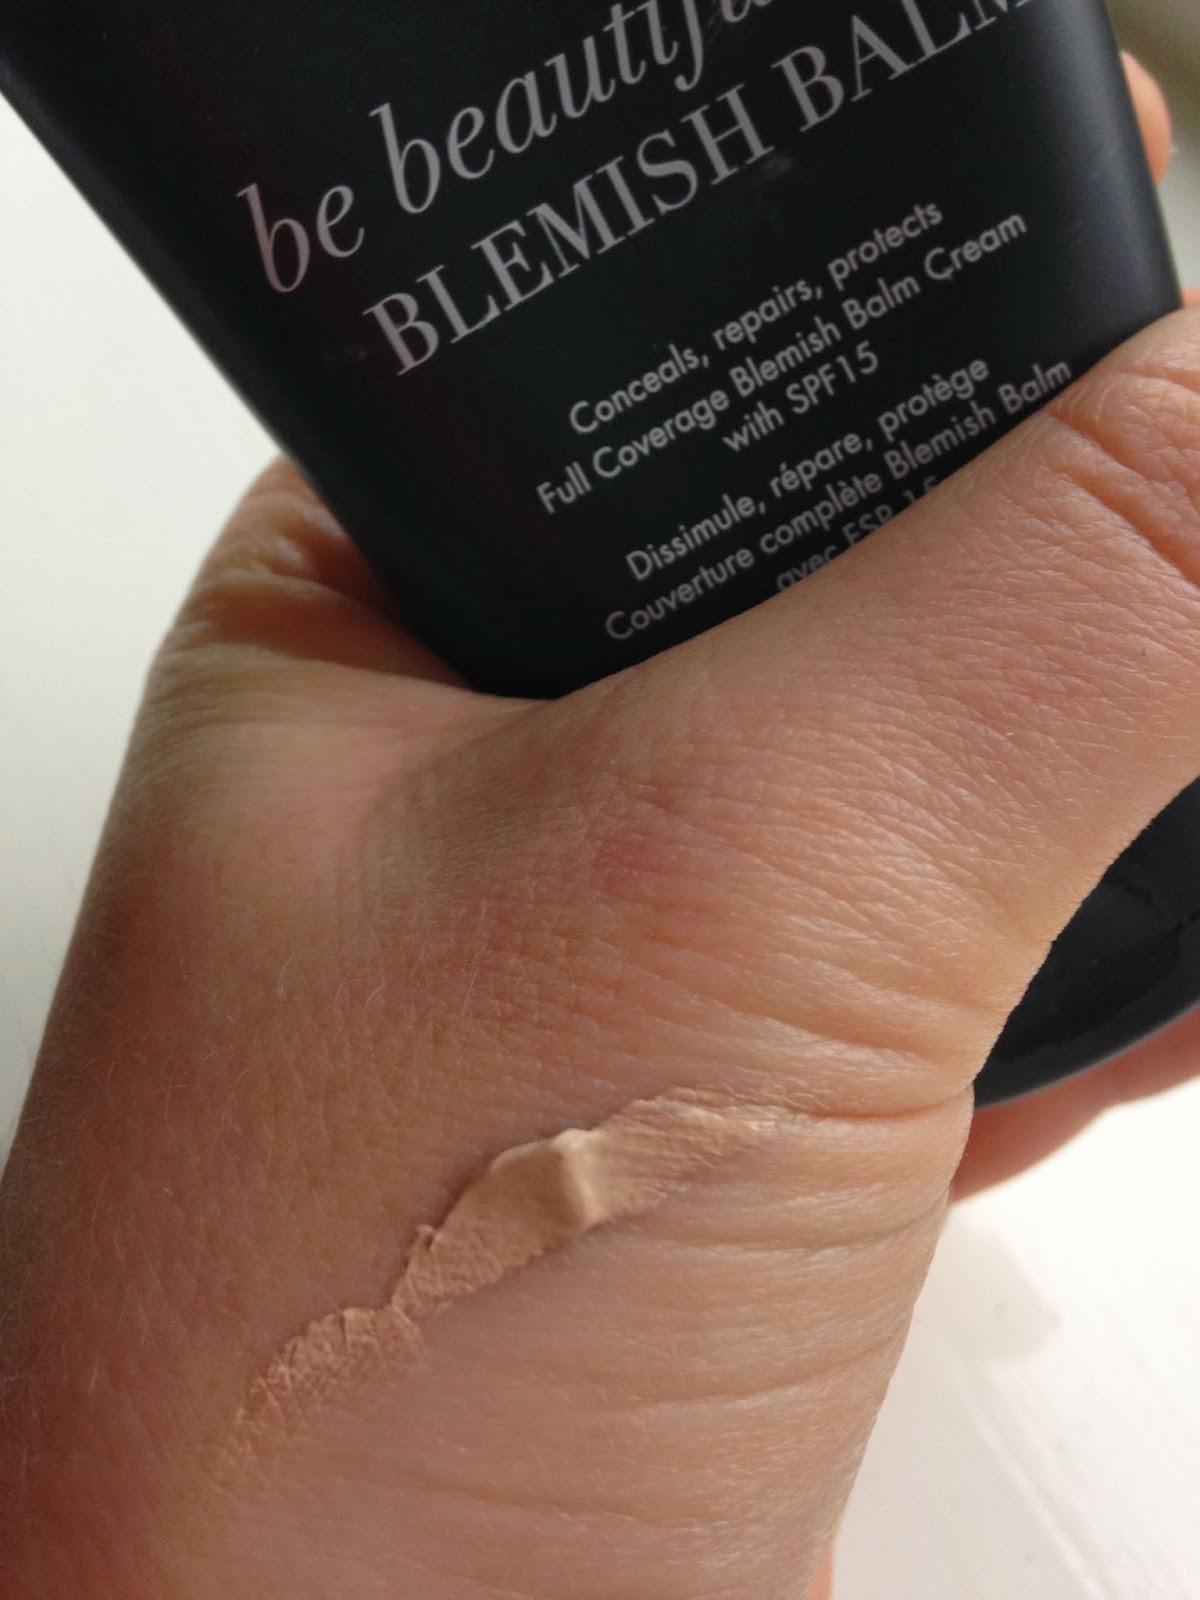 sleek Be Beautiful Blemish Balm in 'Fair'